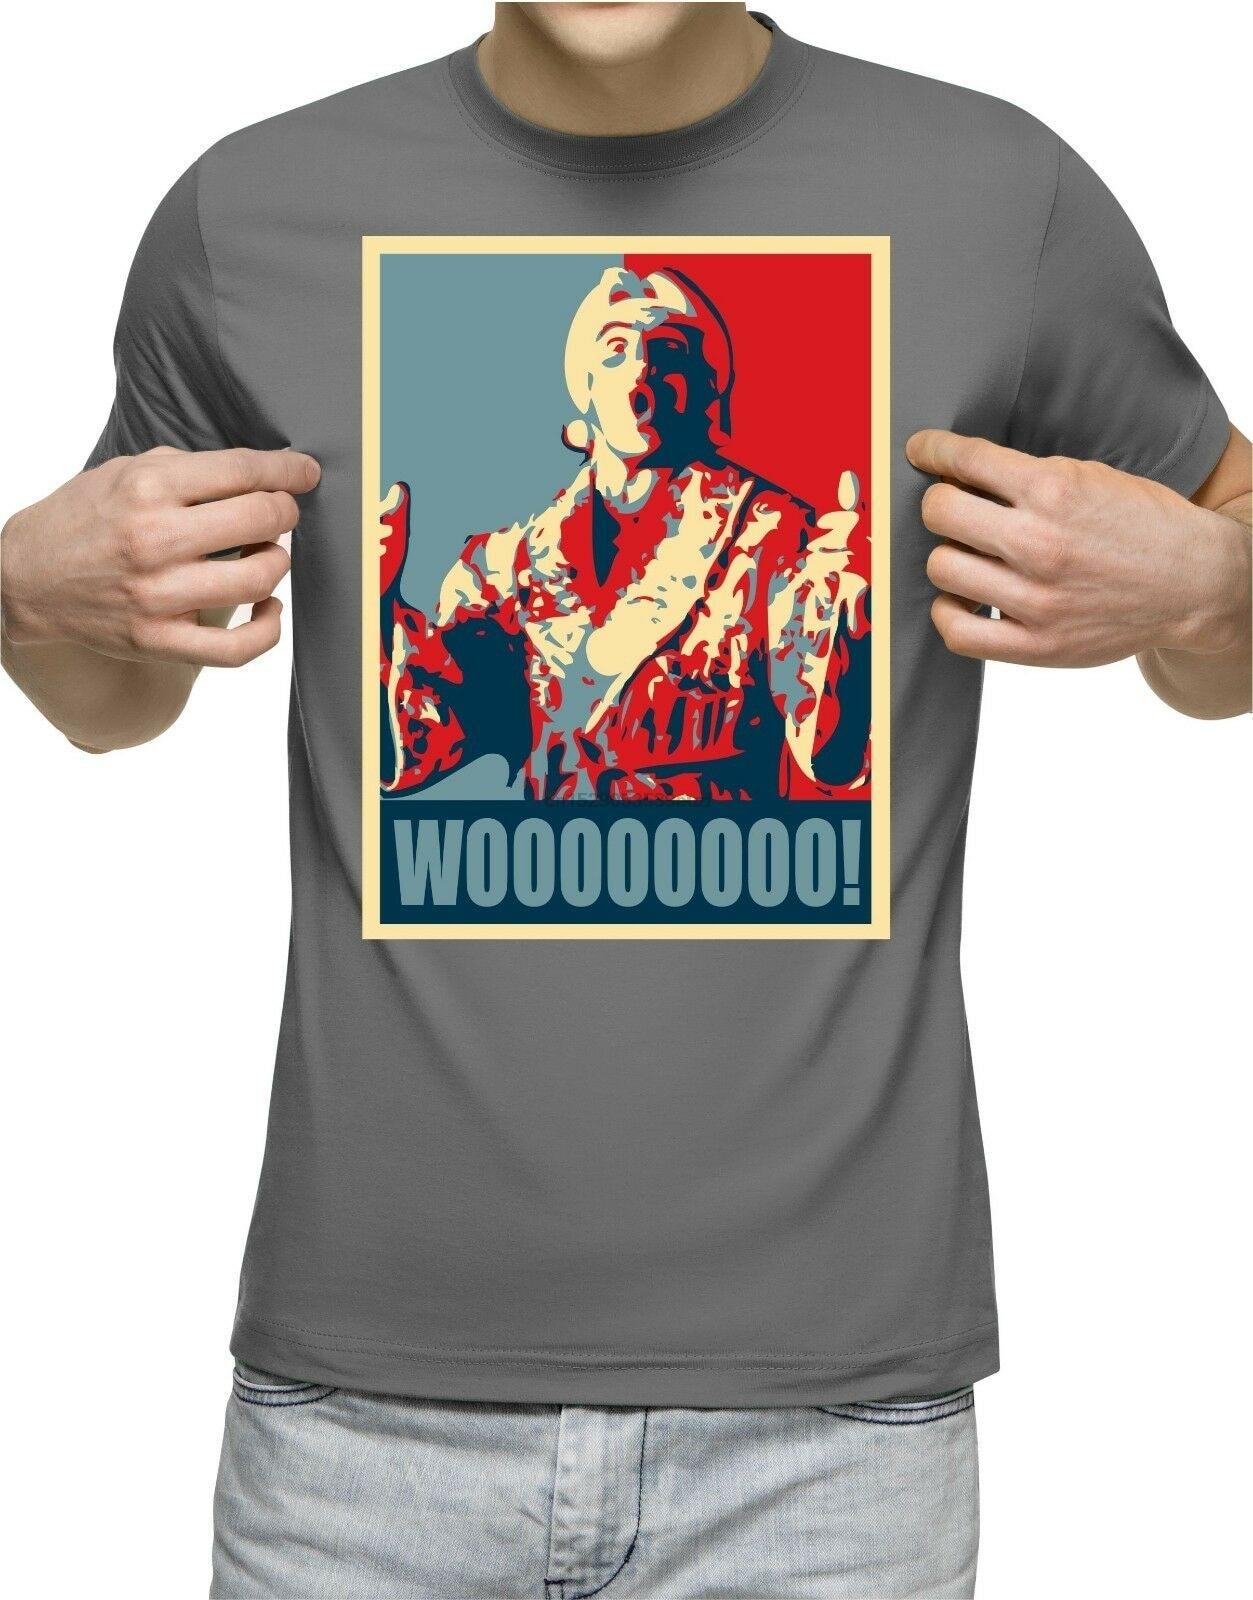 Wooo T-Shirt Ric Flair Funny T Shirt Retro Wrestling Nature Boy Classic Wwf 2(China)